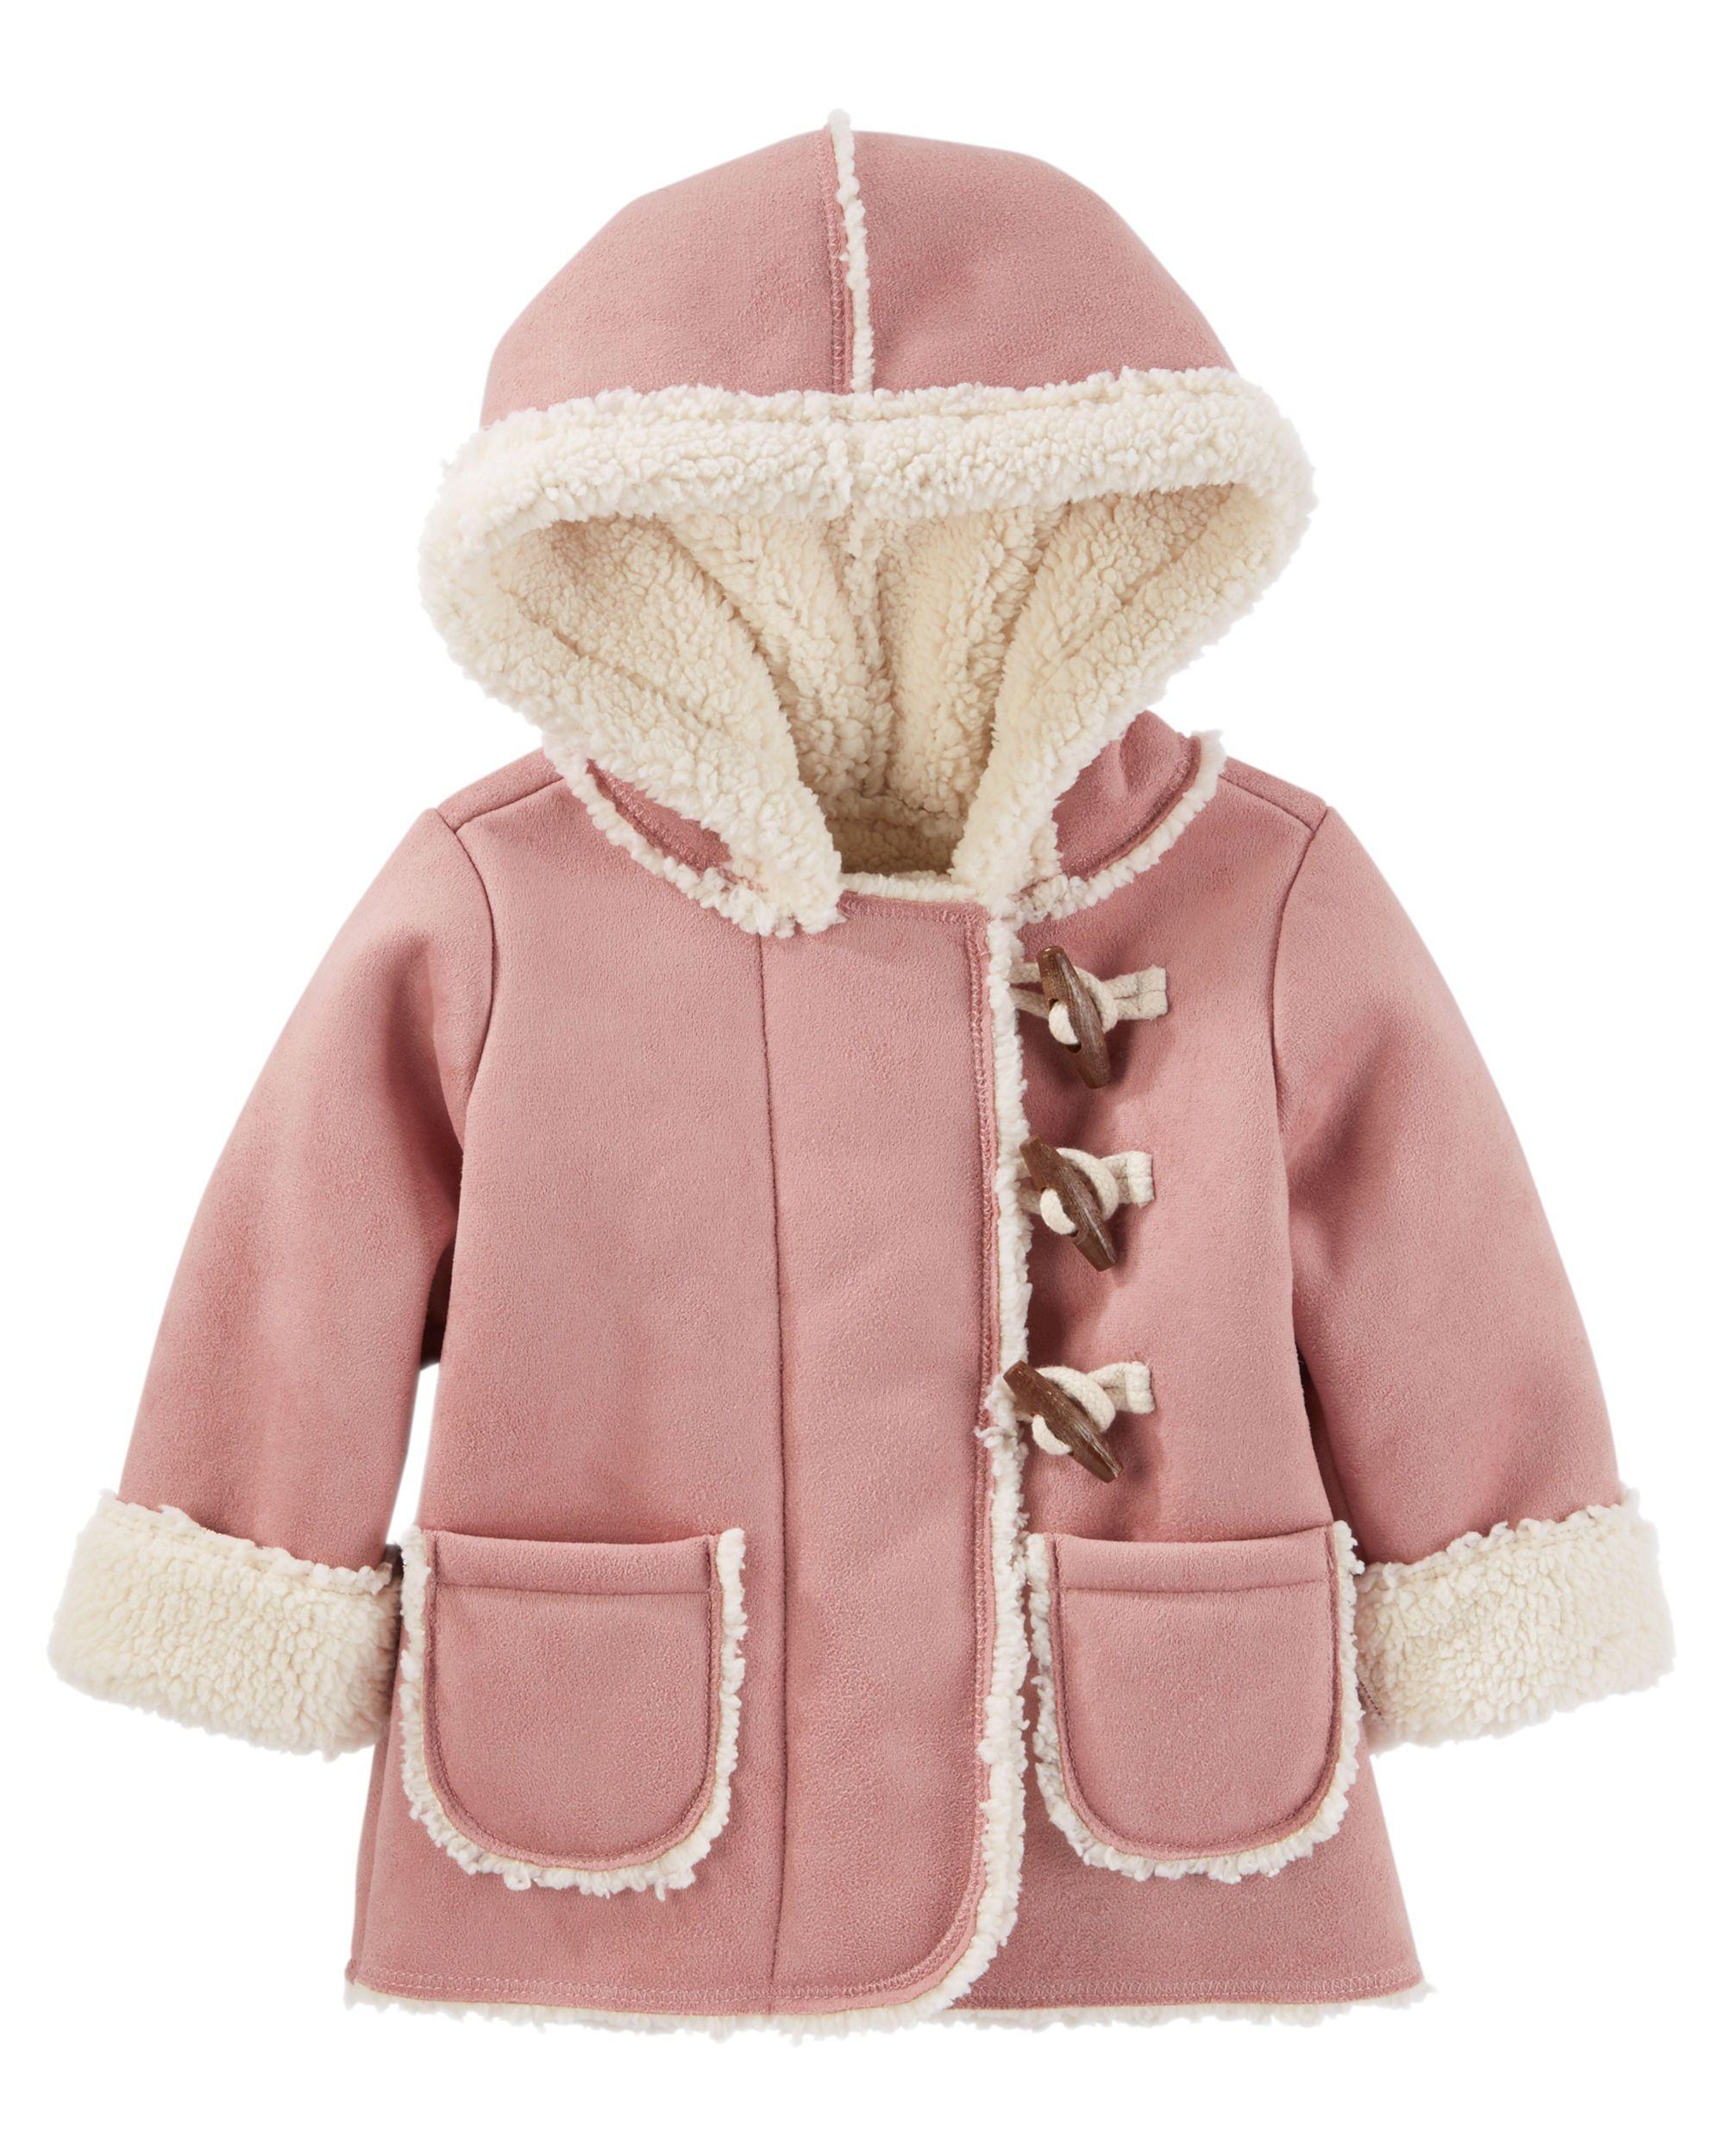 a356e6018723 Baby Girl Sherpa-Lined Toggle Jacket